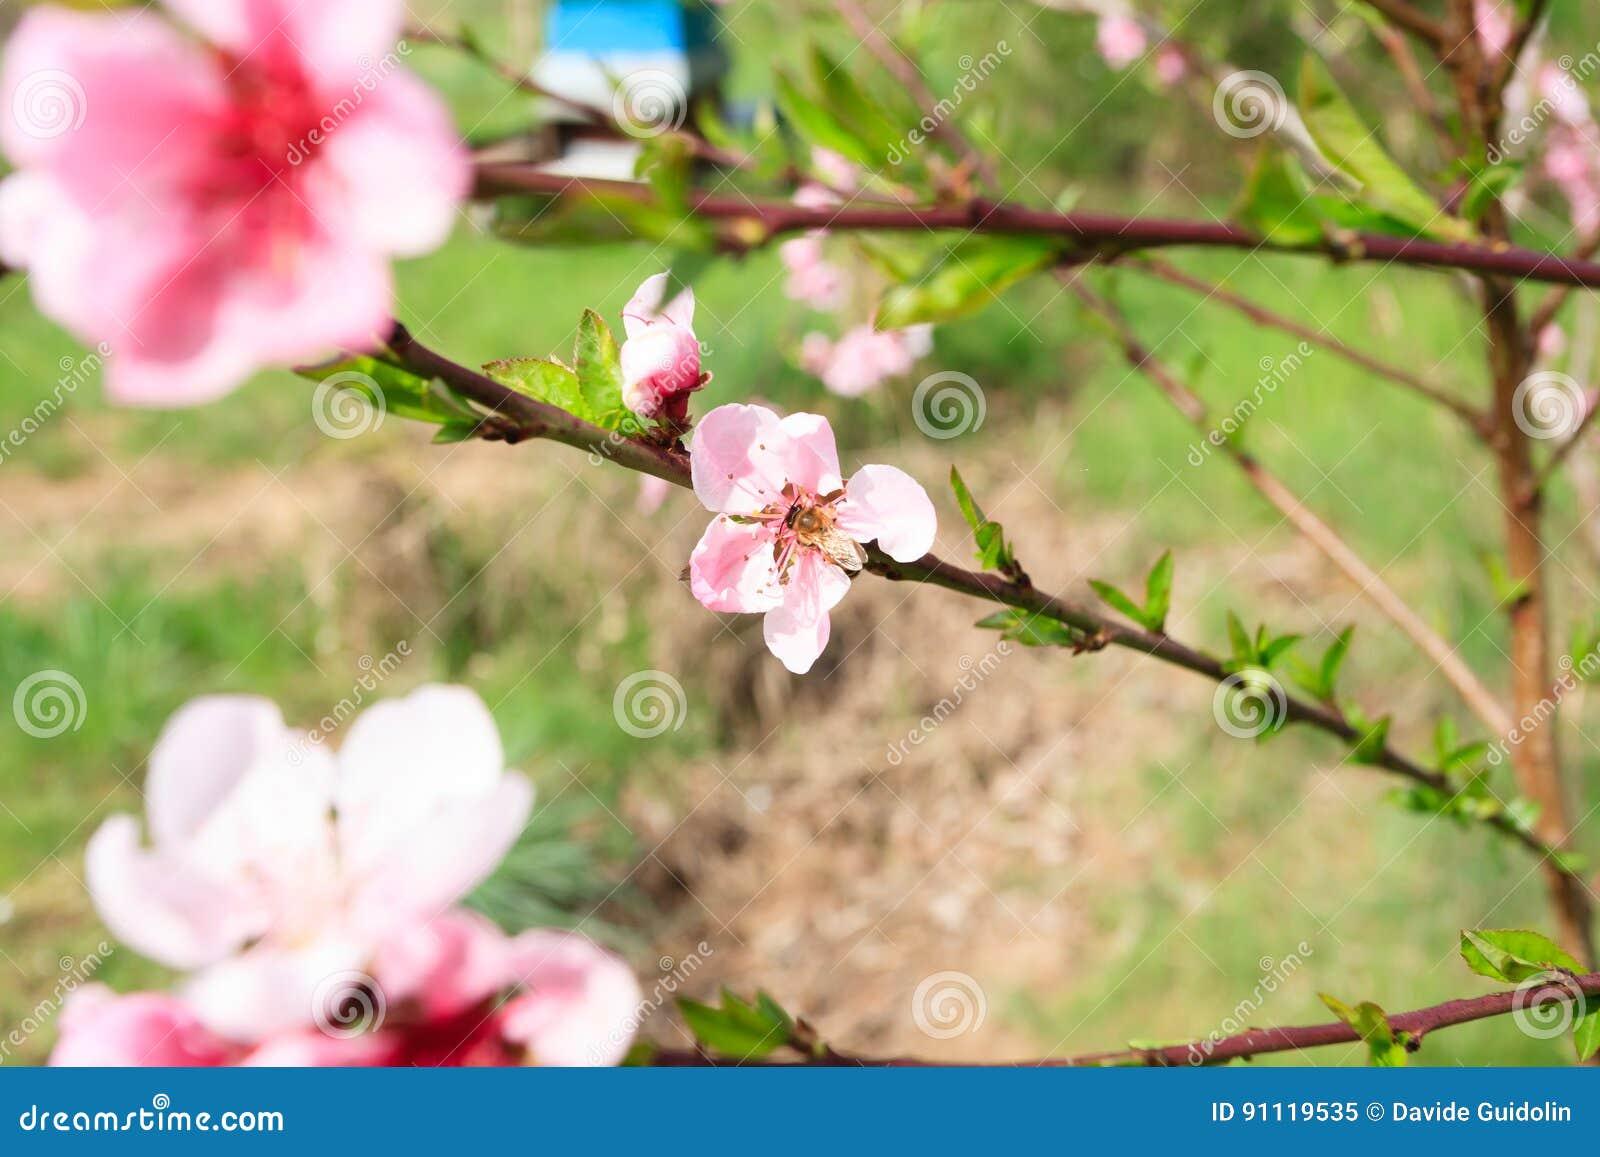 Abelha na flor do pêssego beekeeping